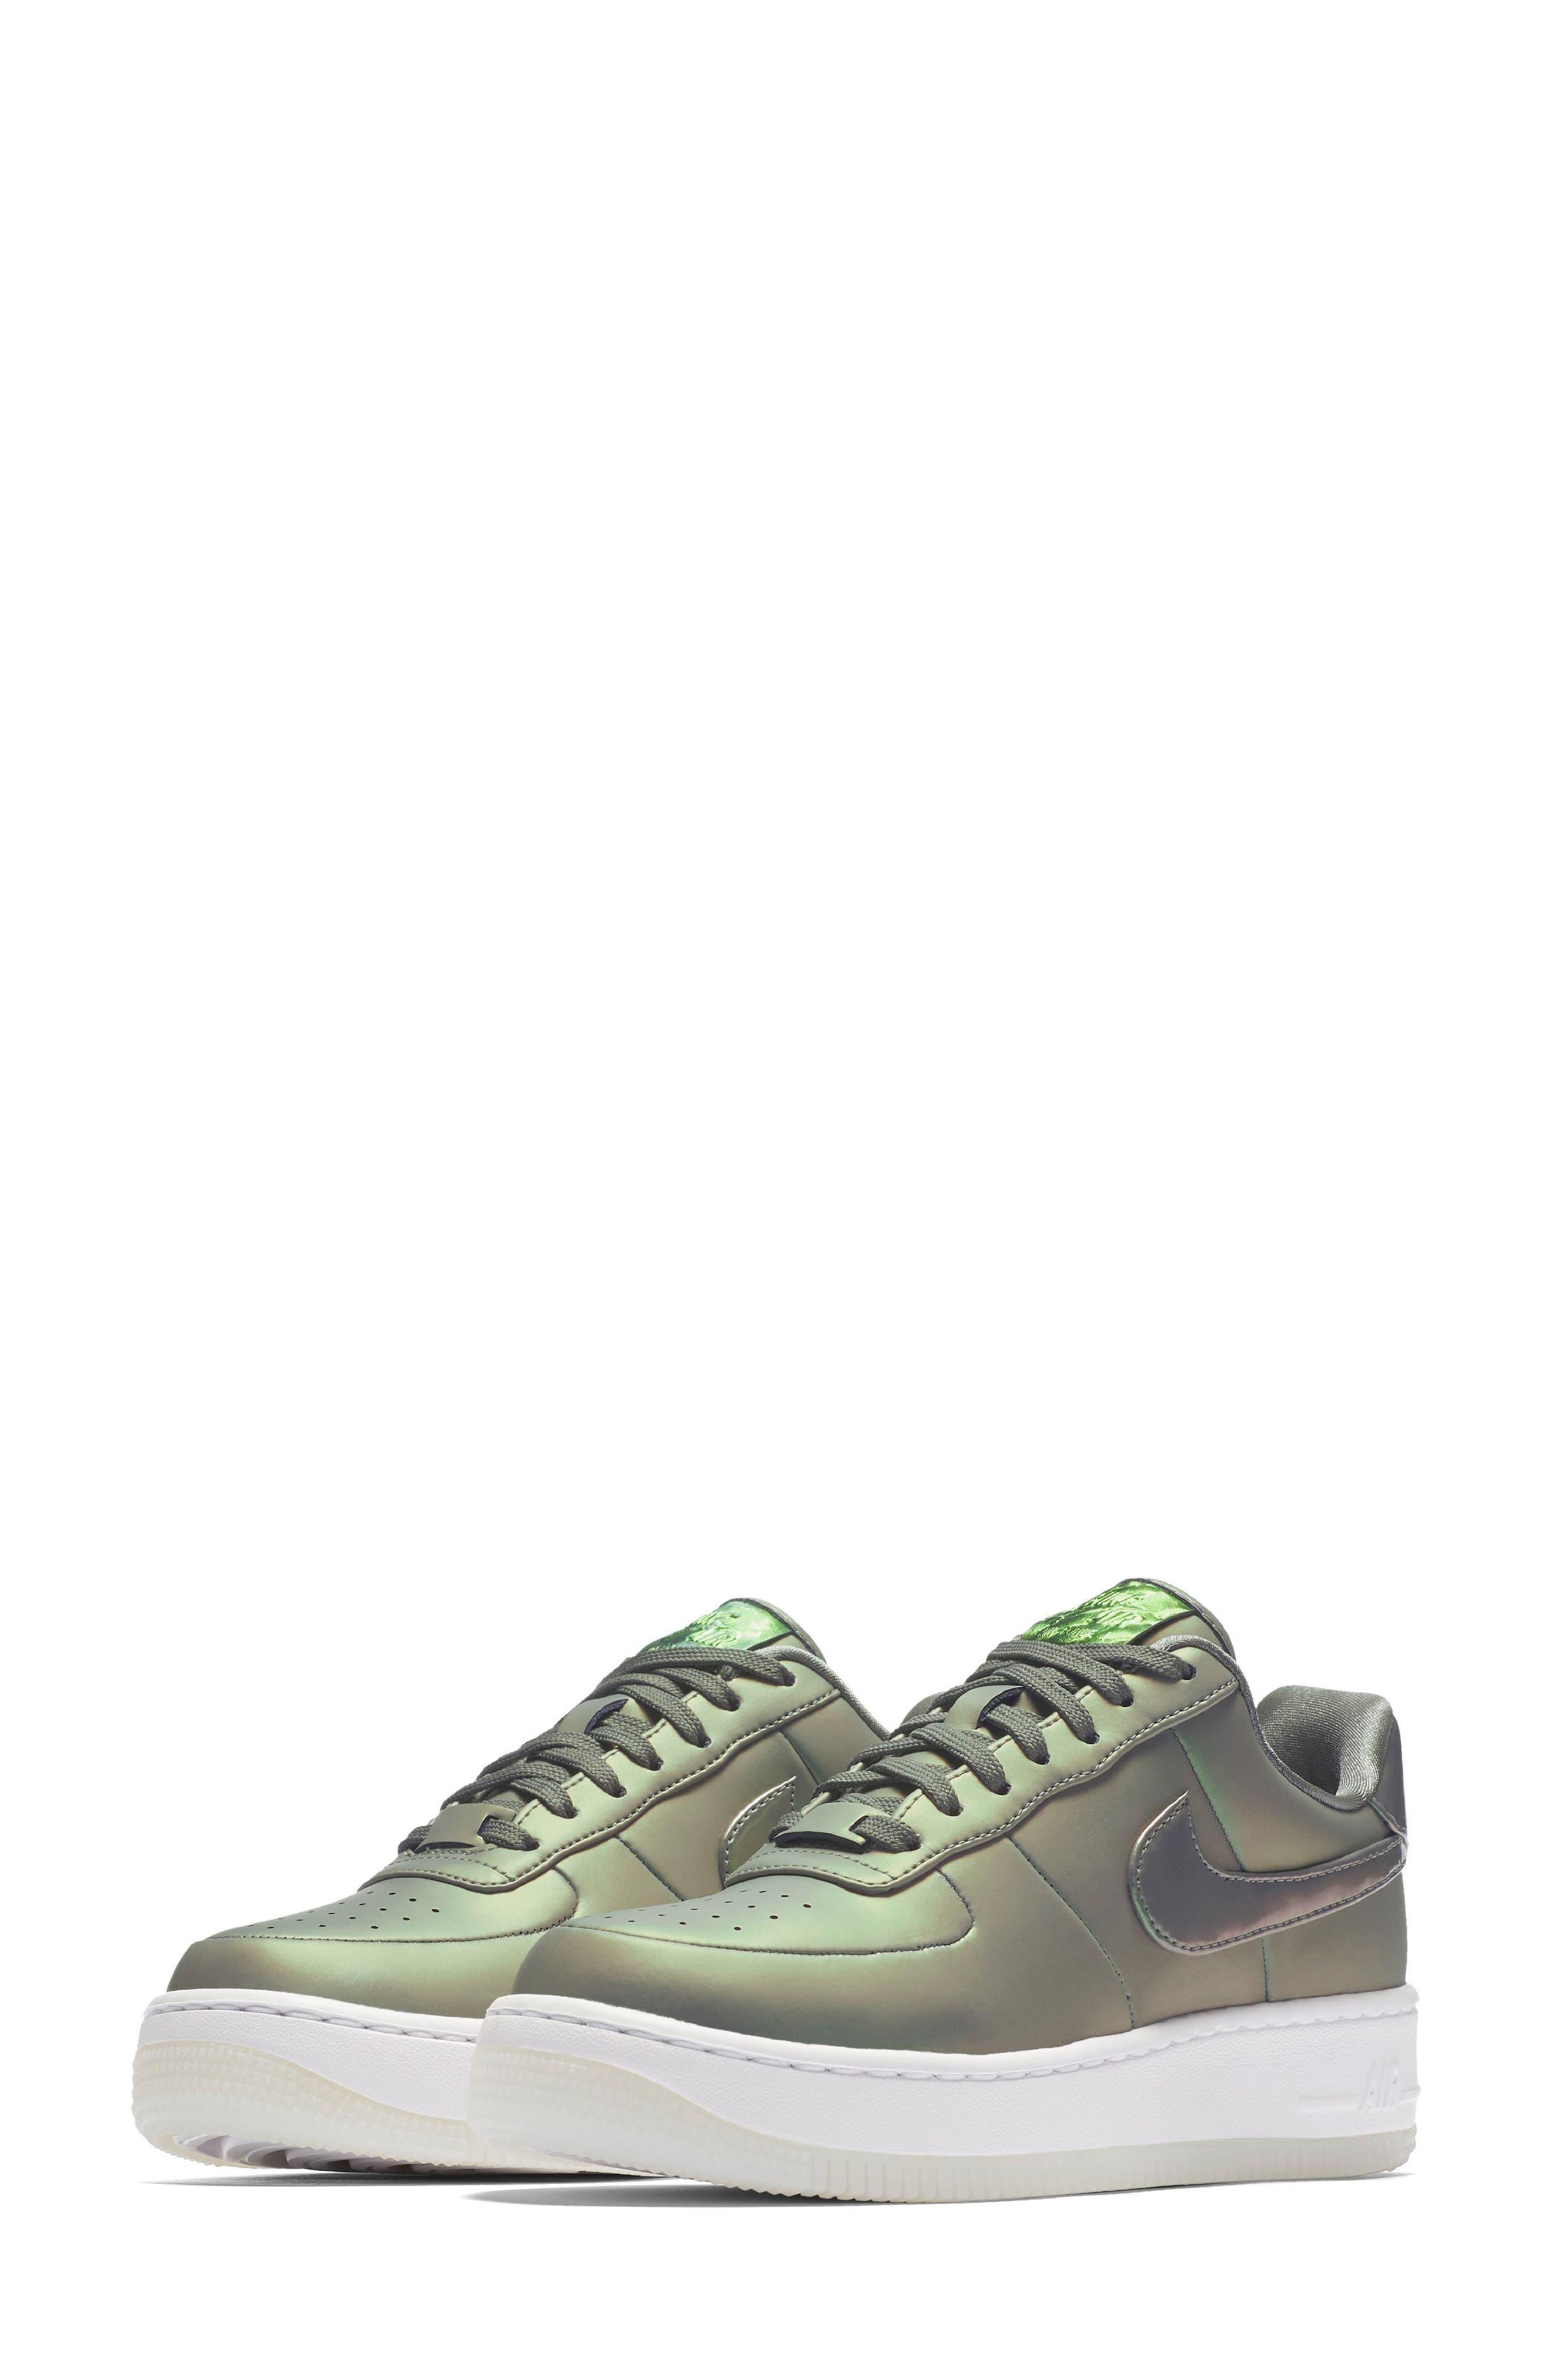 Air Force 1 Upstep Premium LX Shoe,                             Alternate thumbnail 4, color,                             252